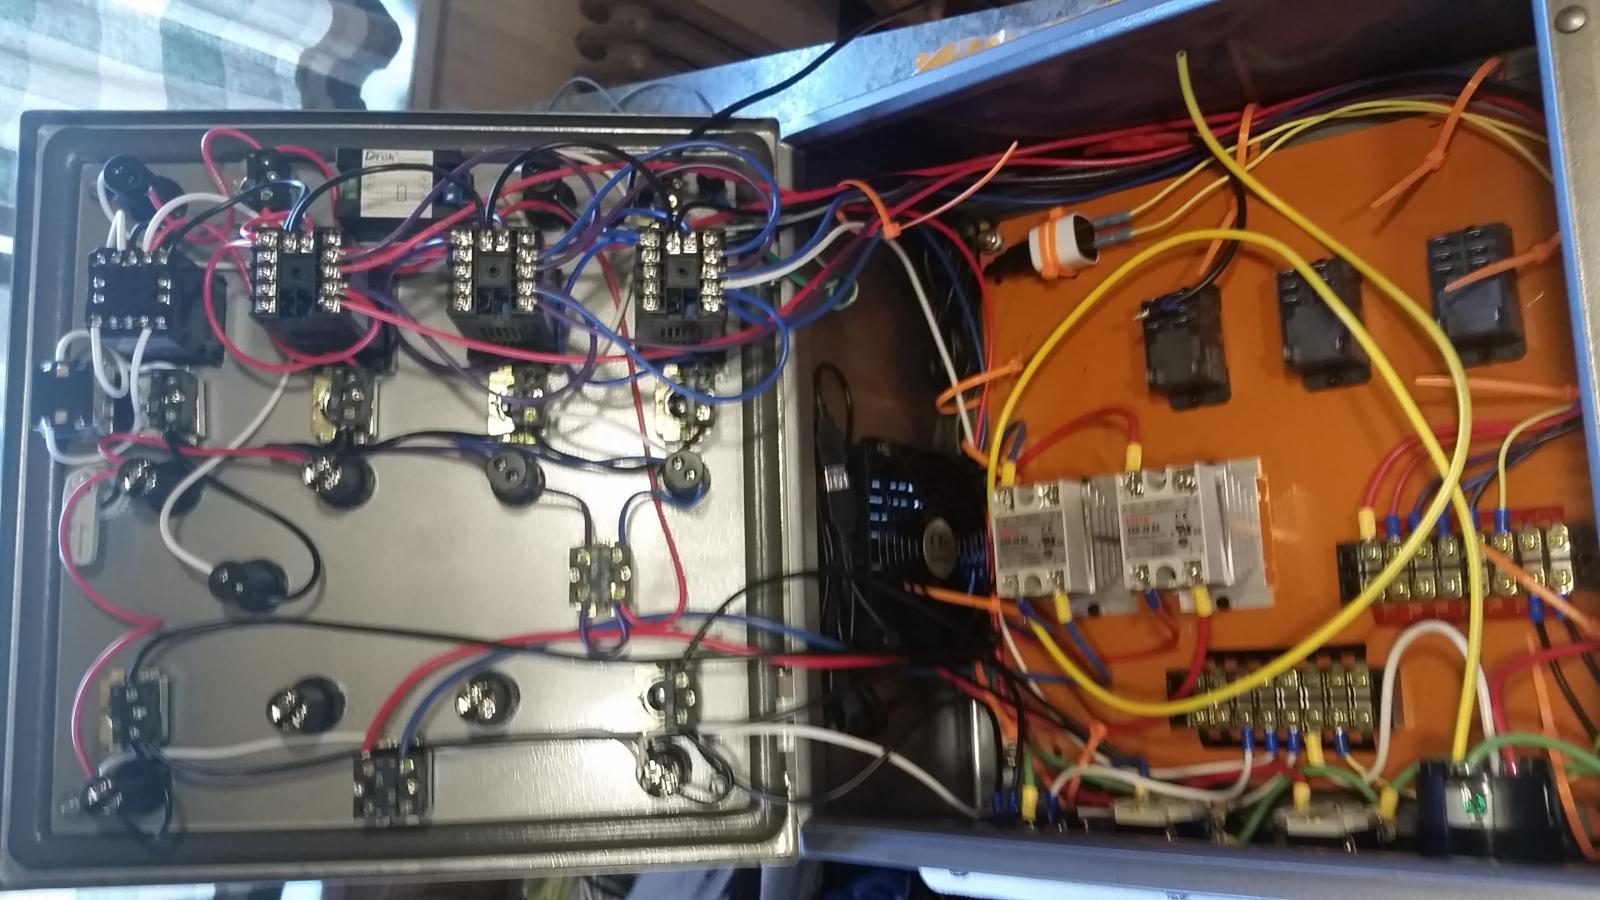 Huge E Herms Build 3 Keggles Control Panel Stir Plate Ferm Wiring Diagram Aandc Contactor 20160421 124406